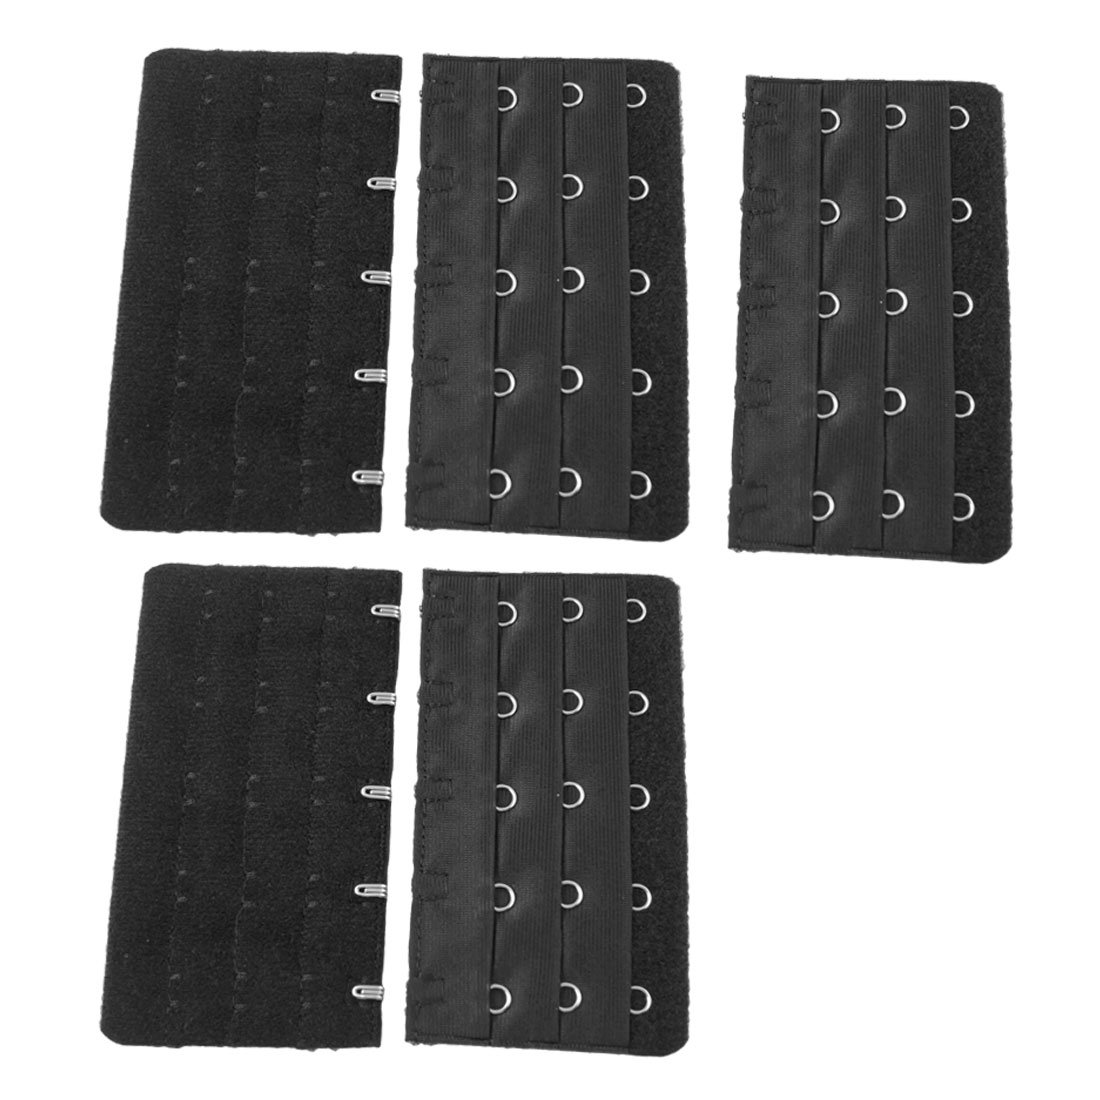 NEW Black 5 Rows Hook and Eye Tape Extension Bra Strap Extender 5 Pcs for Women